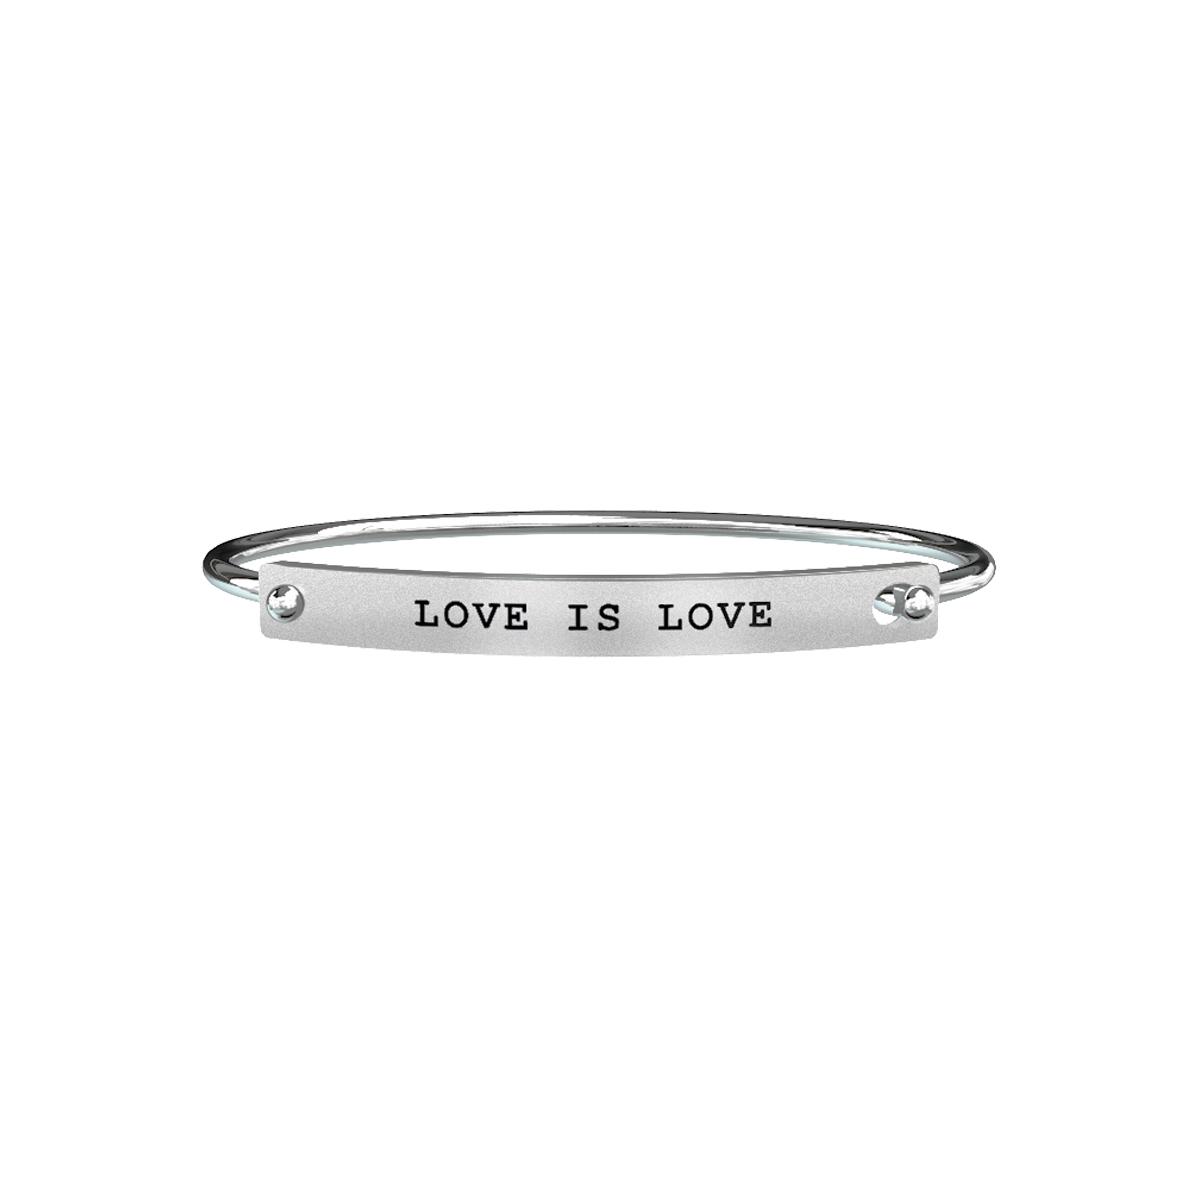 Bracciale Kidult Uomo Love LOVE IS LOVE